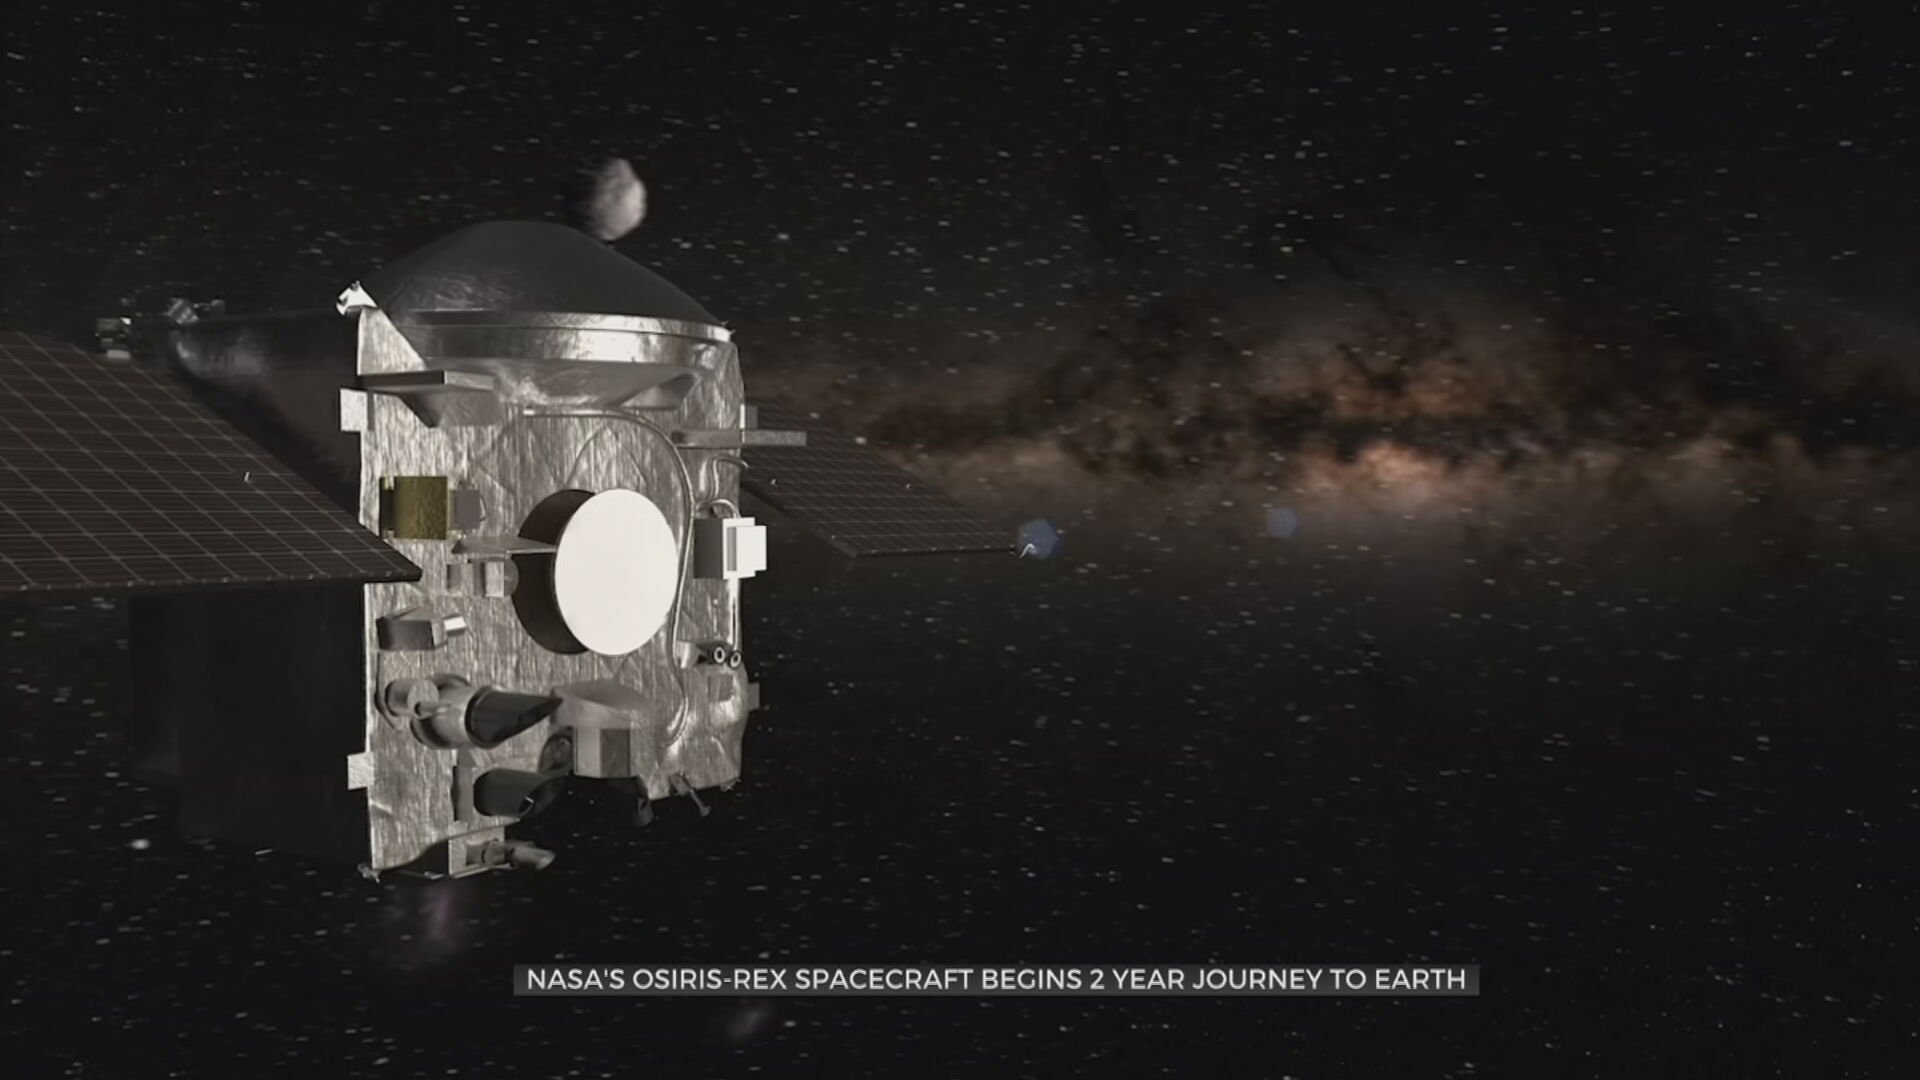 NASA's Osiris-Rex Spacecraft Begins 2-Year Journey To Earth